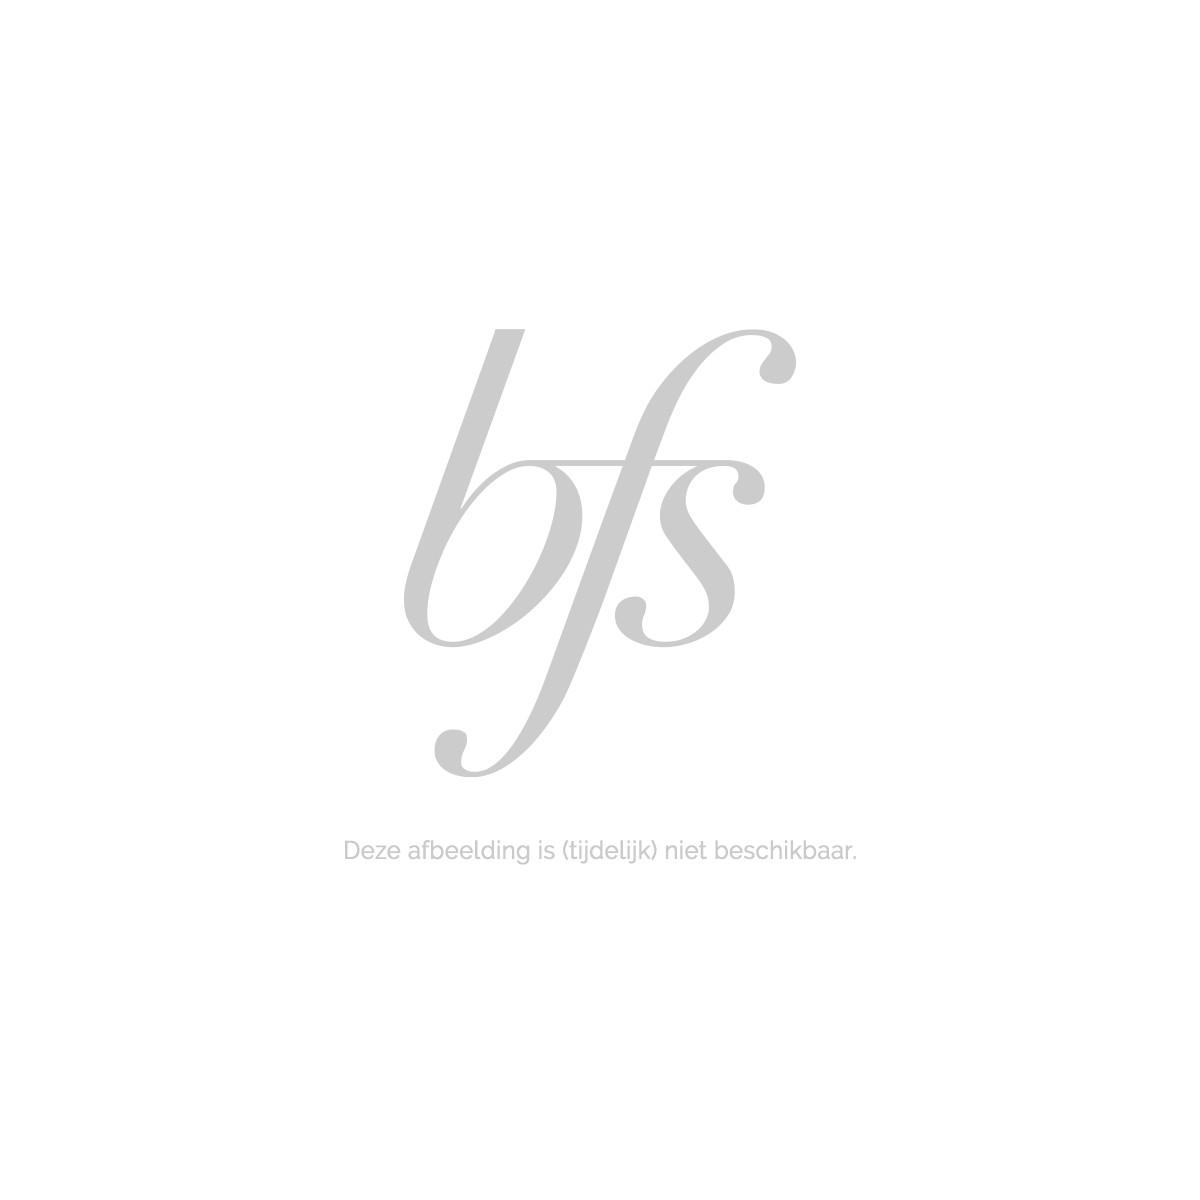 Chanel Coco refill Eau de Parfum 60 ml